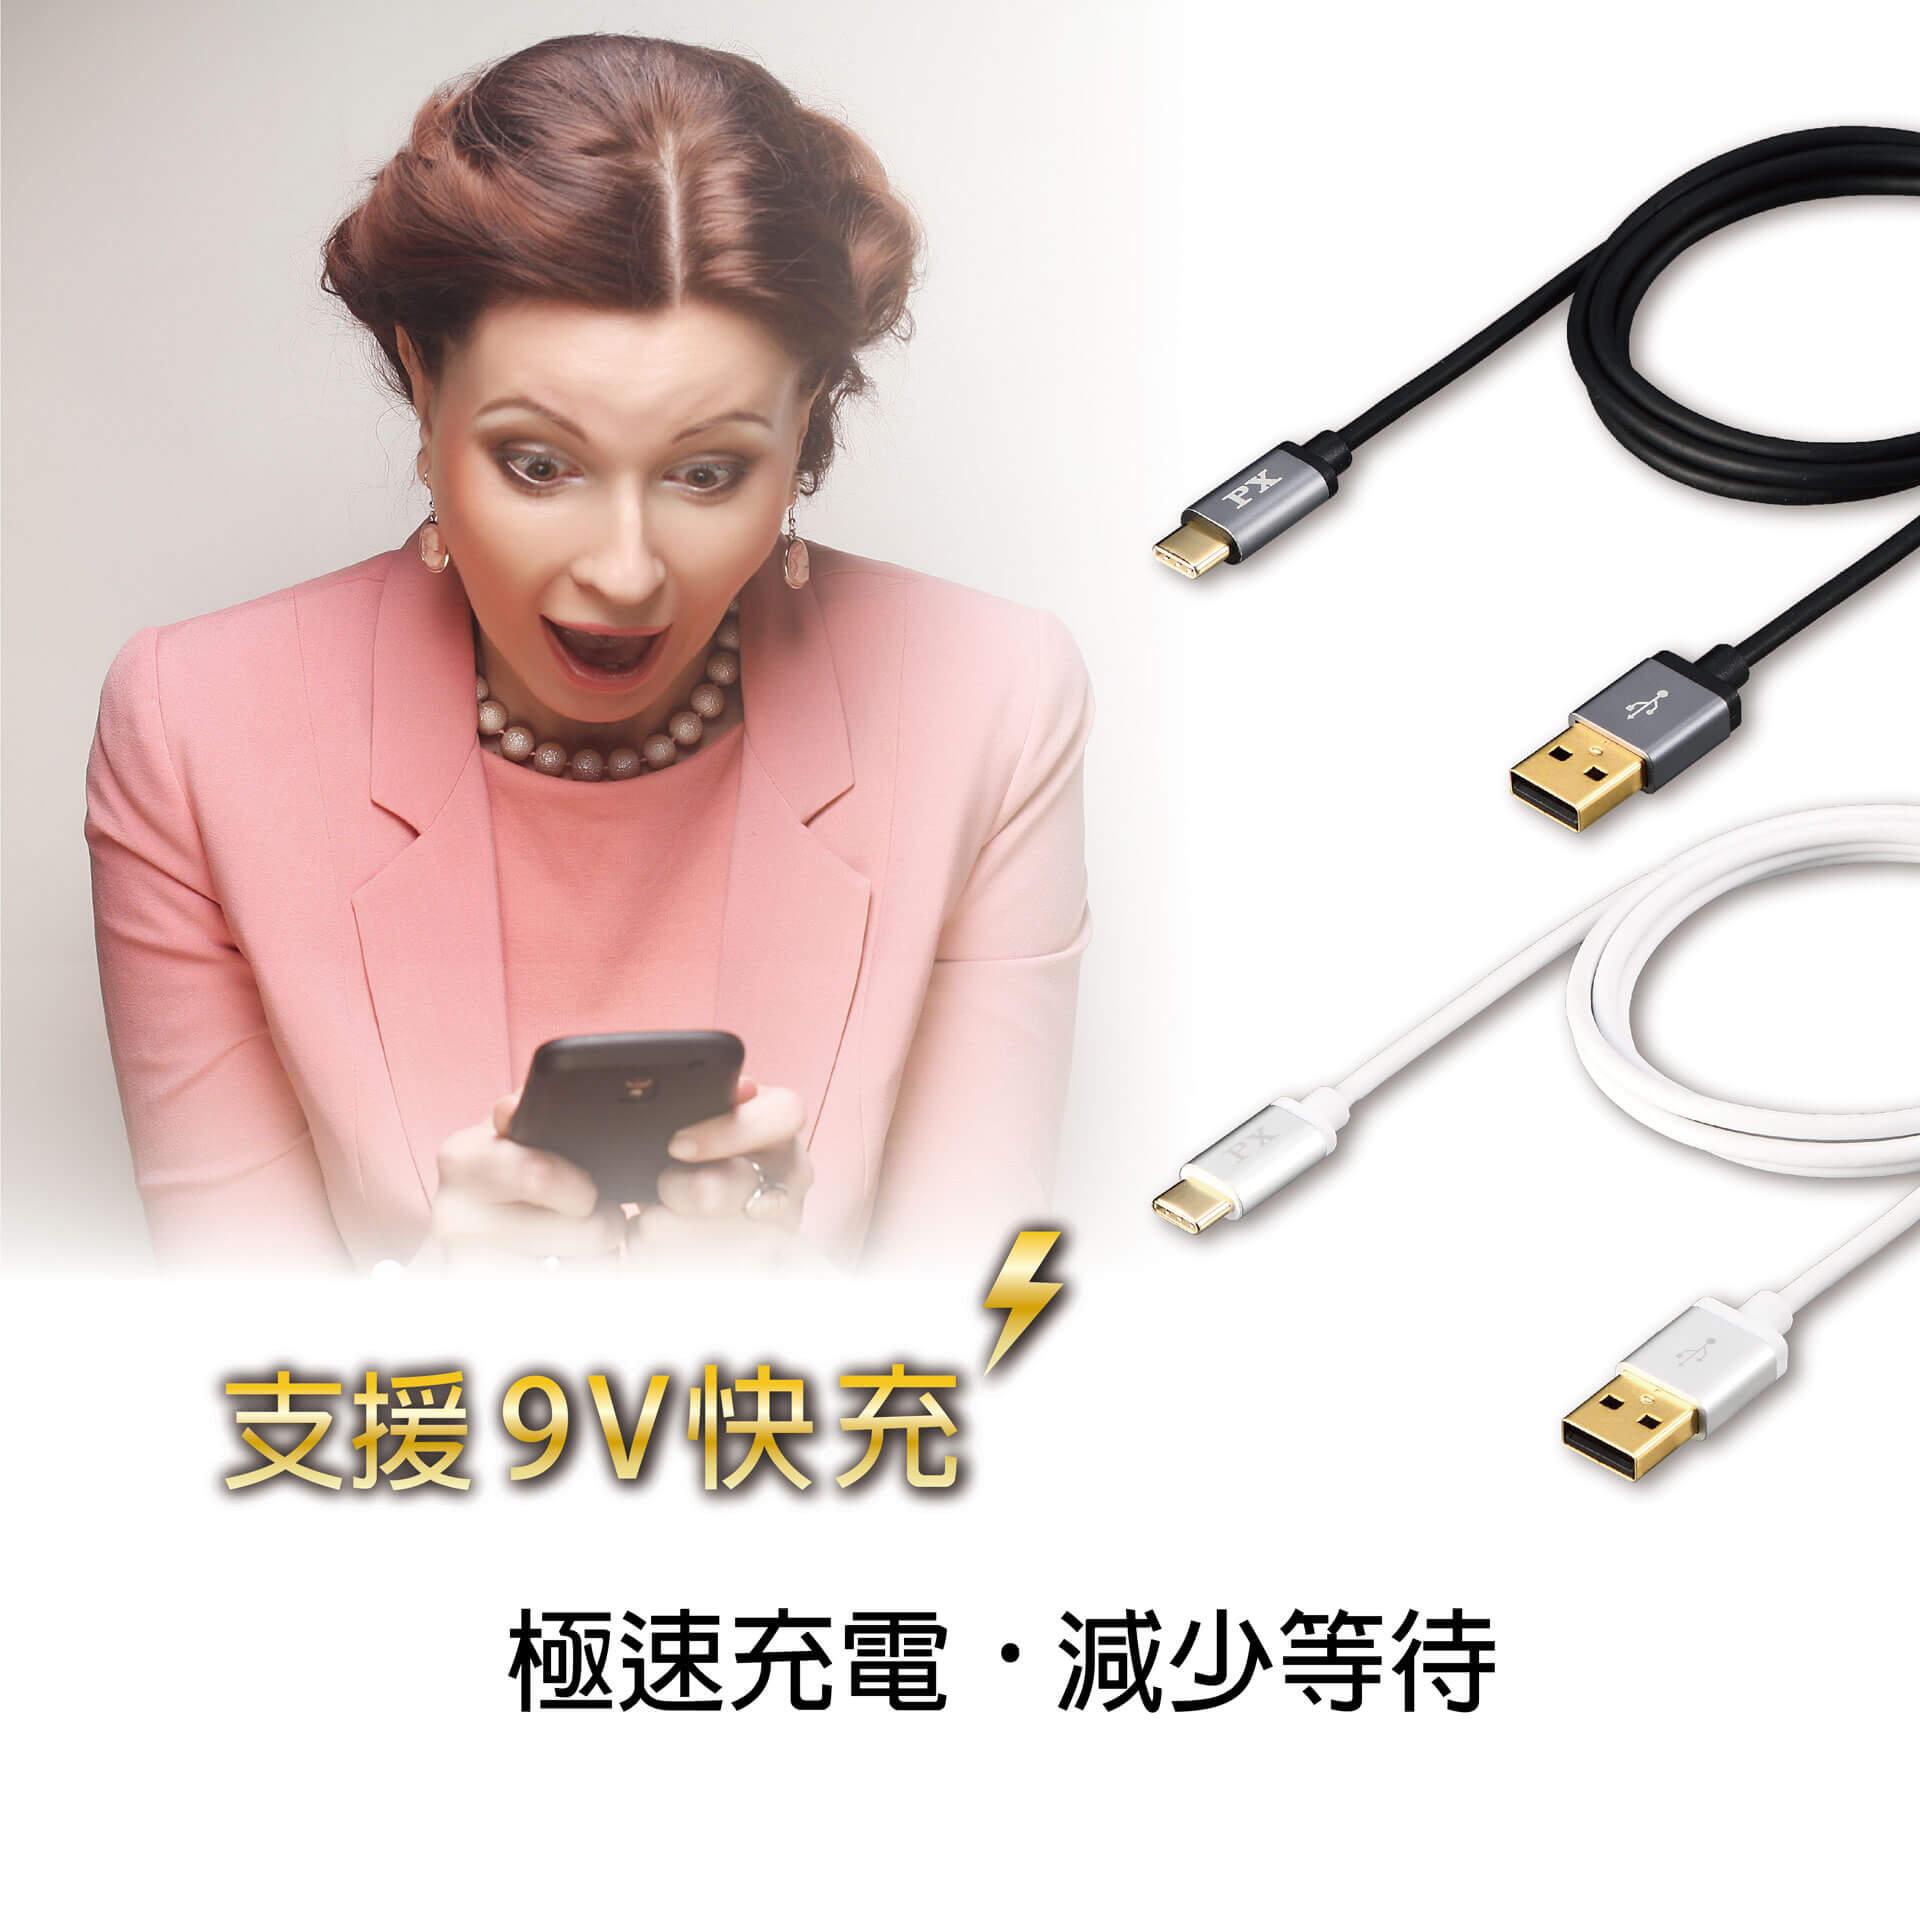 proimages/product/pro-02/pro02-001/UAC2-2B/UAC2-2B-5.jpg